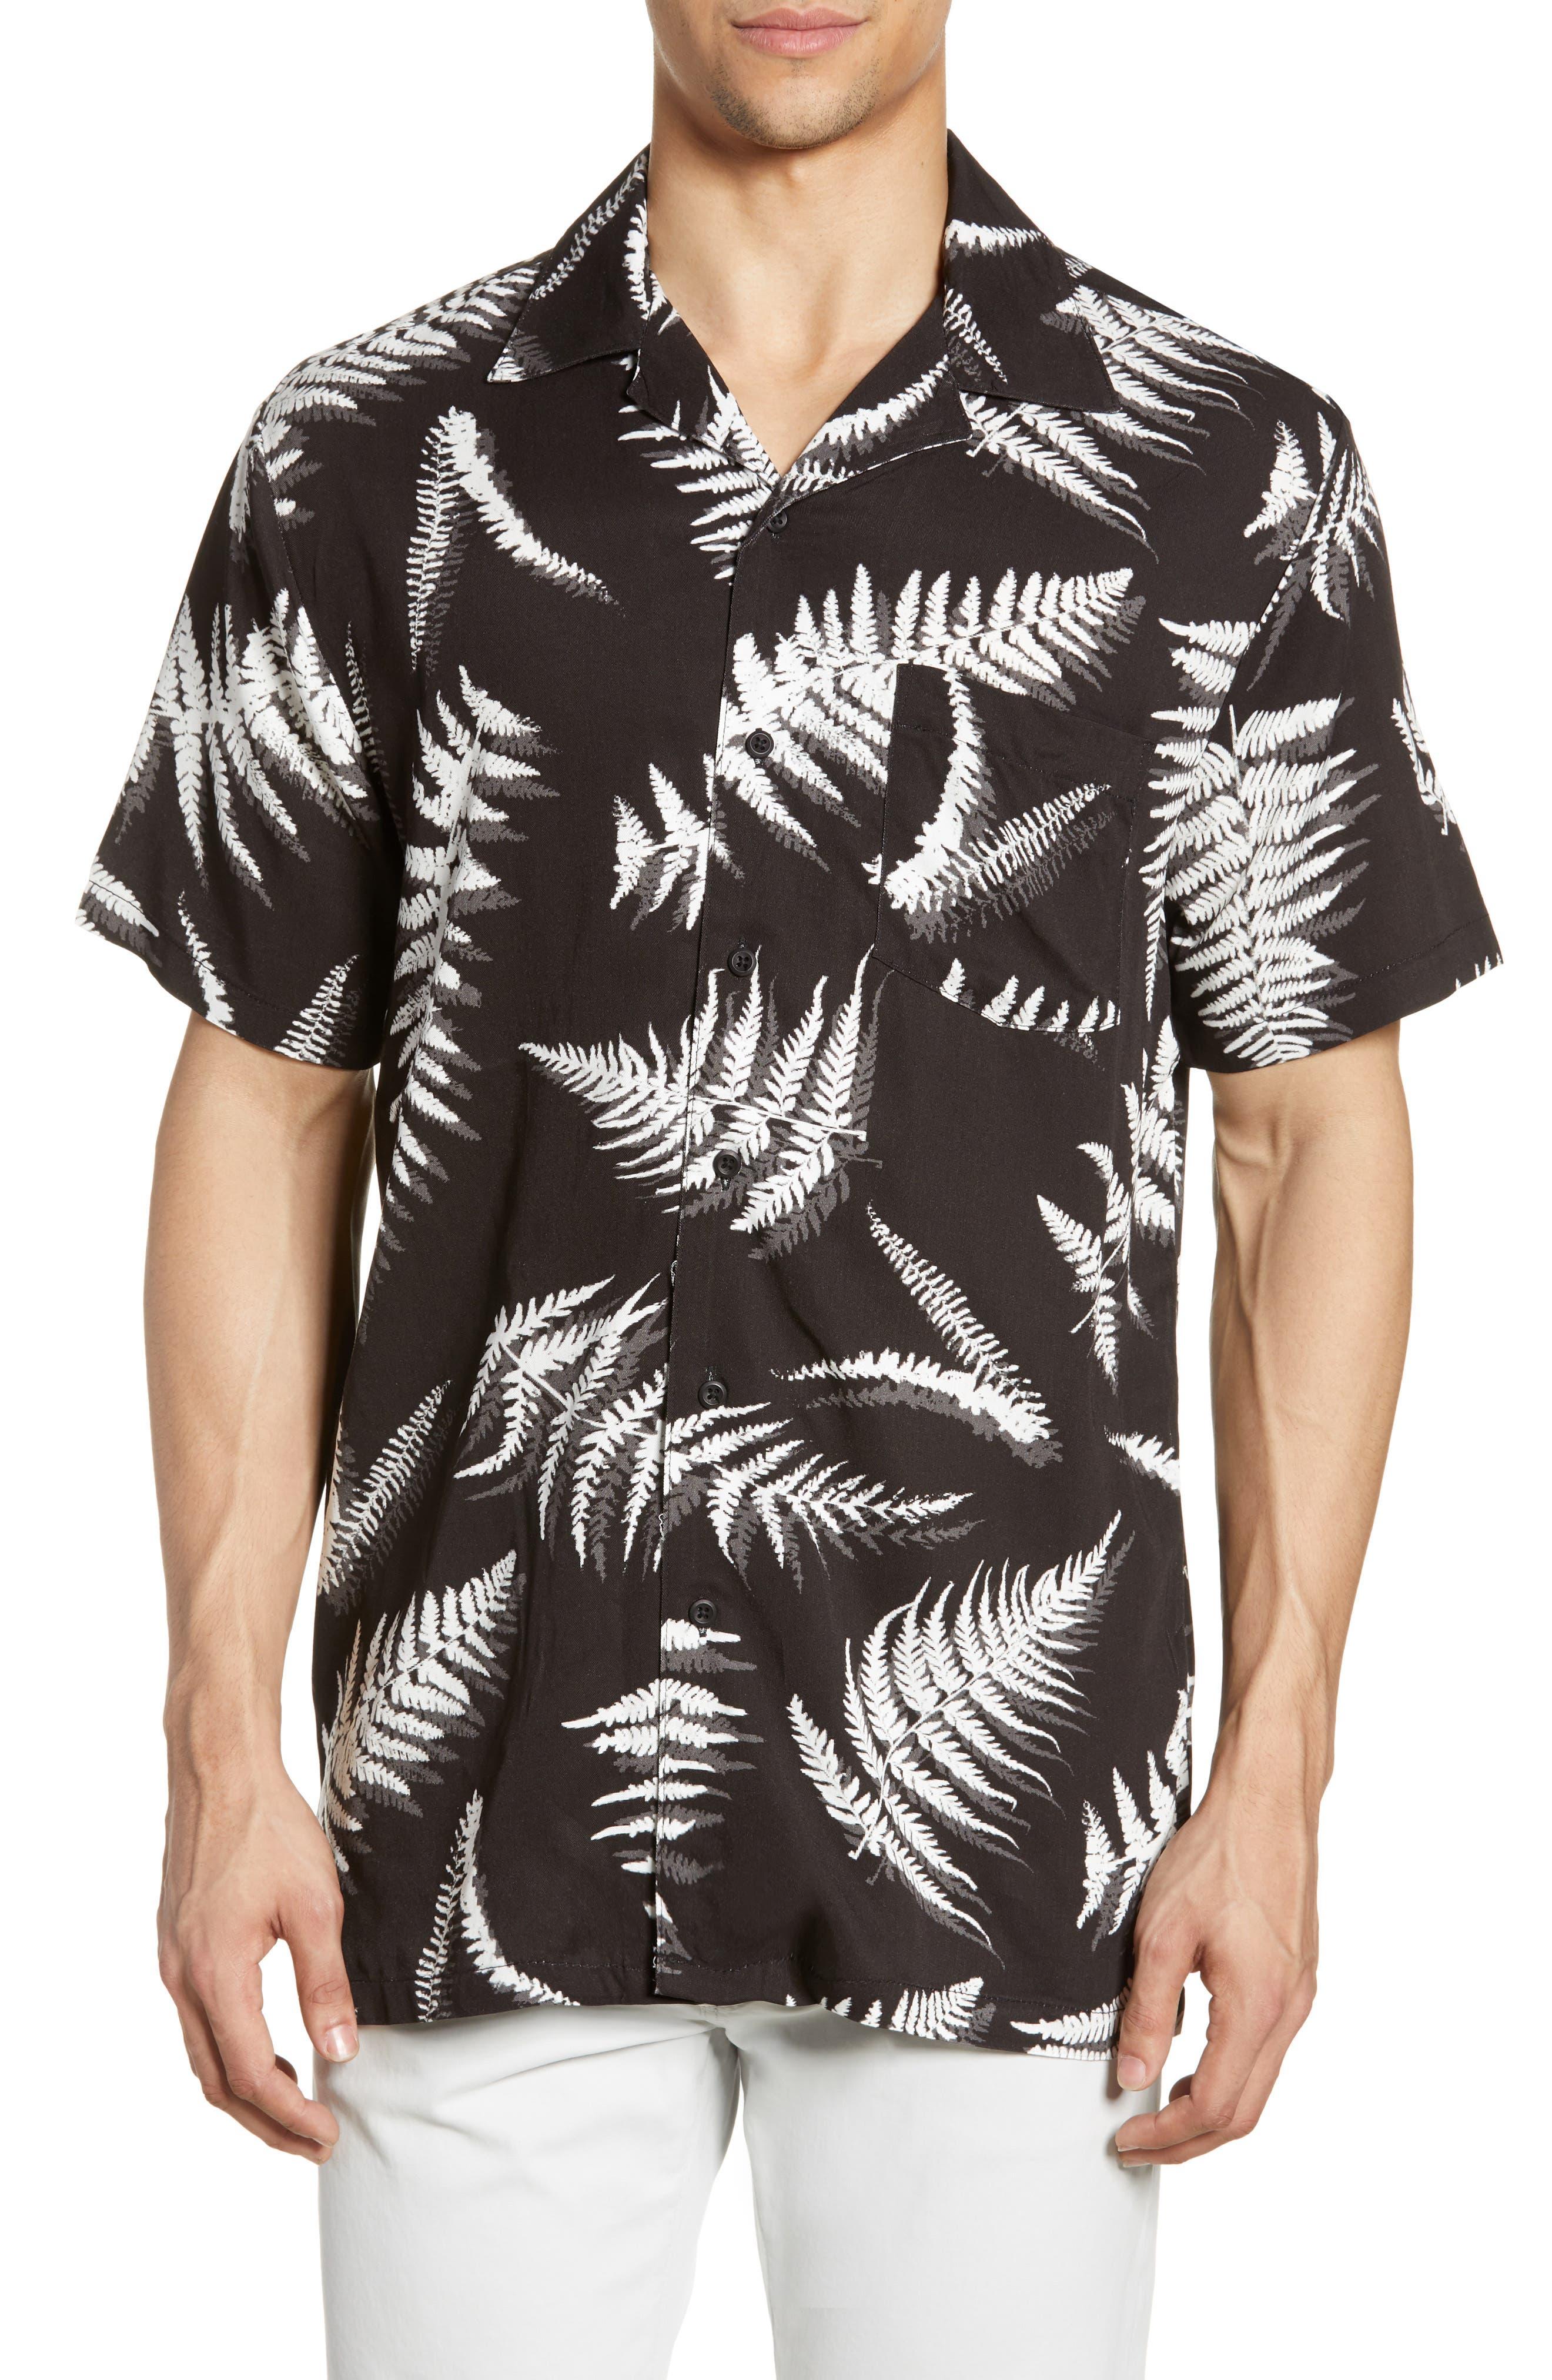 Onia T-shirts Fern Leaves Vacation Shirt